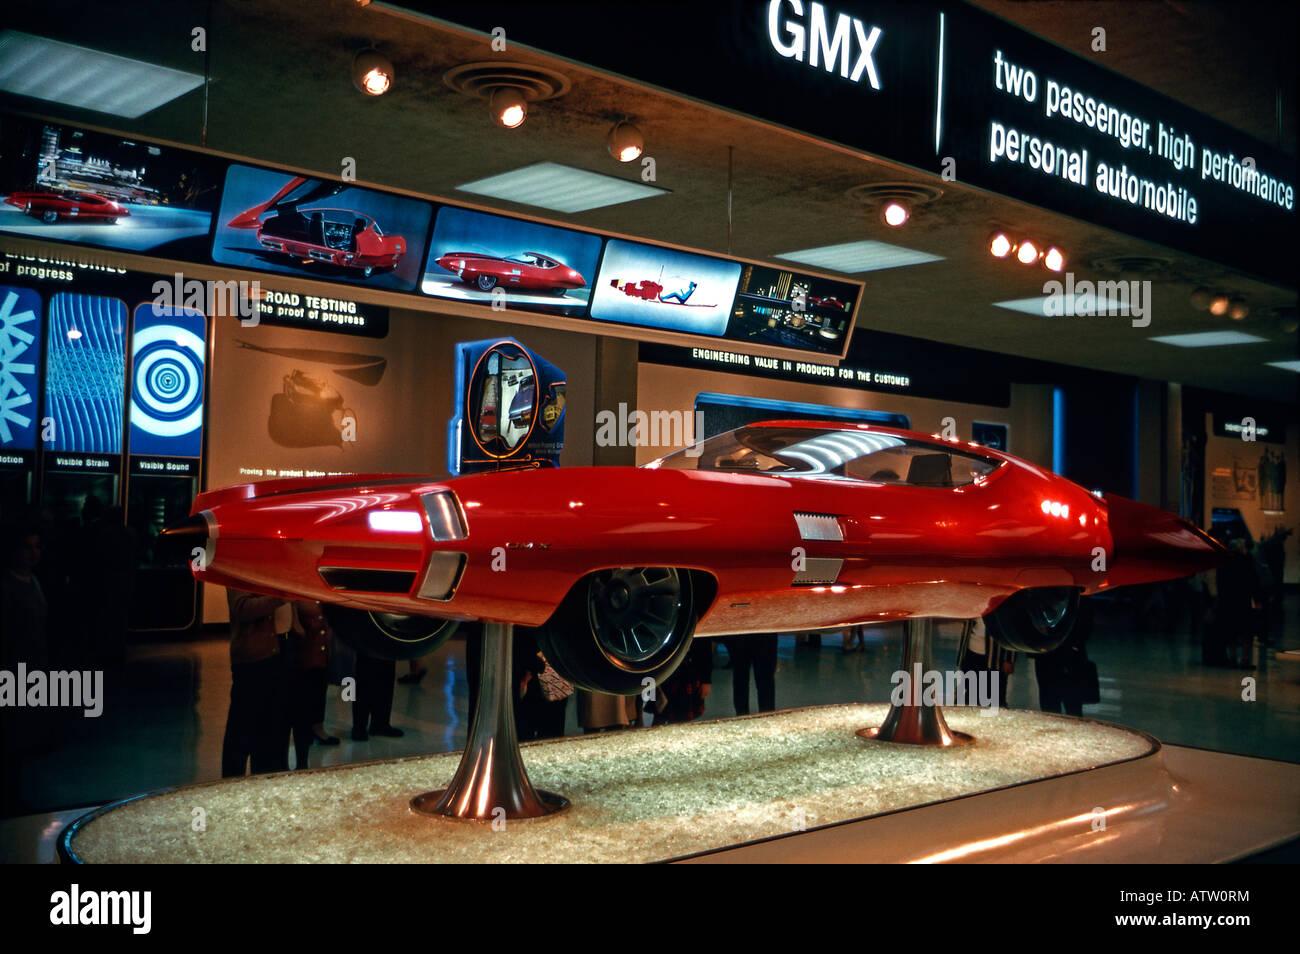 General motors gm x stiletto concept car new york world 39 s for General motors new cars